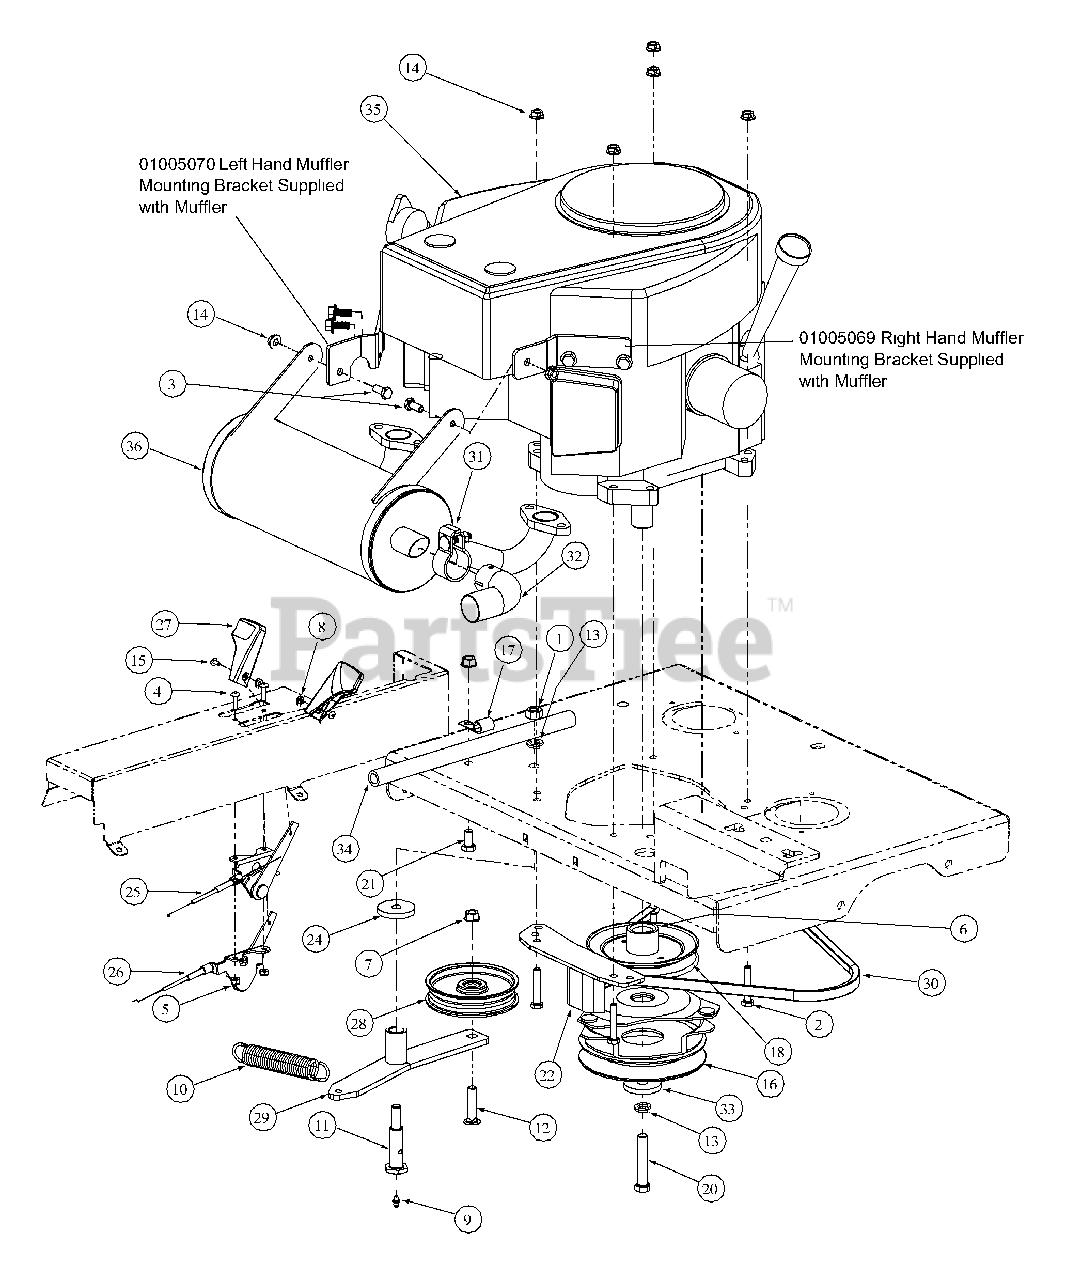 [DIAGRAM_3US]  DIAGRAM] Cadet Kawasaki FULL Version HD Quality Engine Diagram -  REKLAMGRAFIK.CHEFSCUISINIERSAIN.FR | Kawasaki Engine Parts Diagrams |  | reklamgrafik.chefscuisiniersain.fr